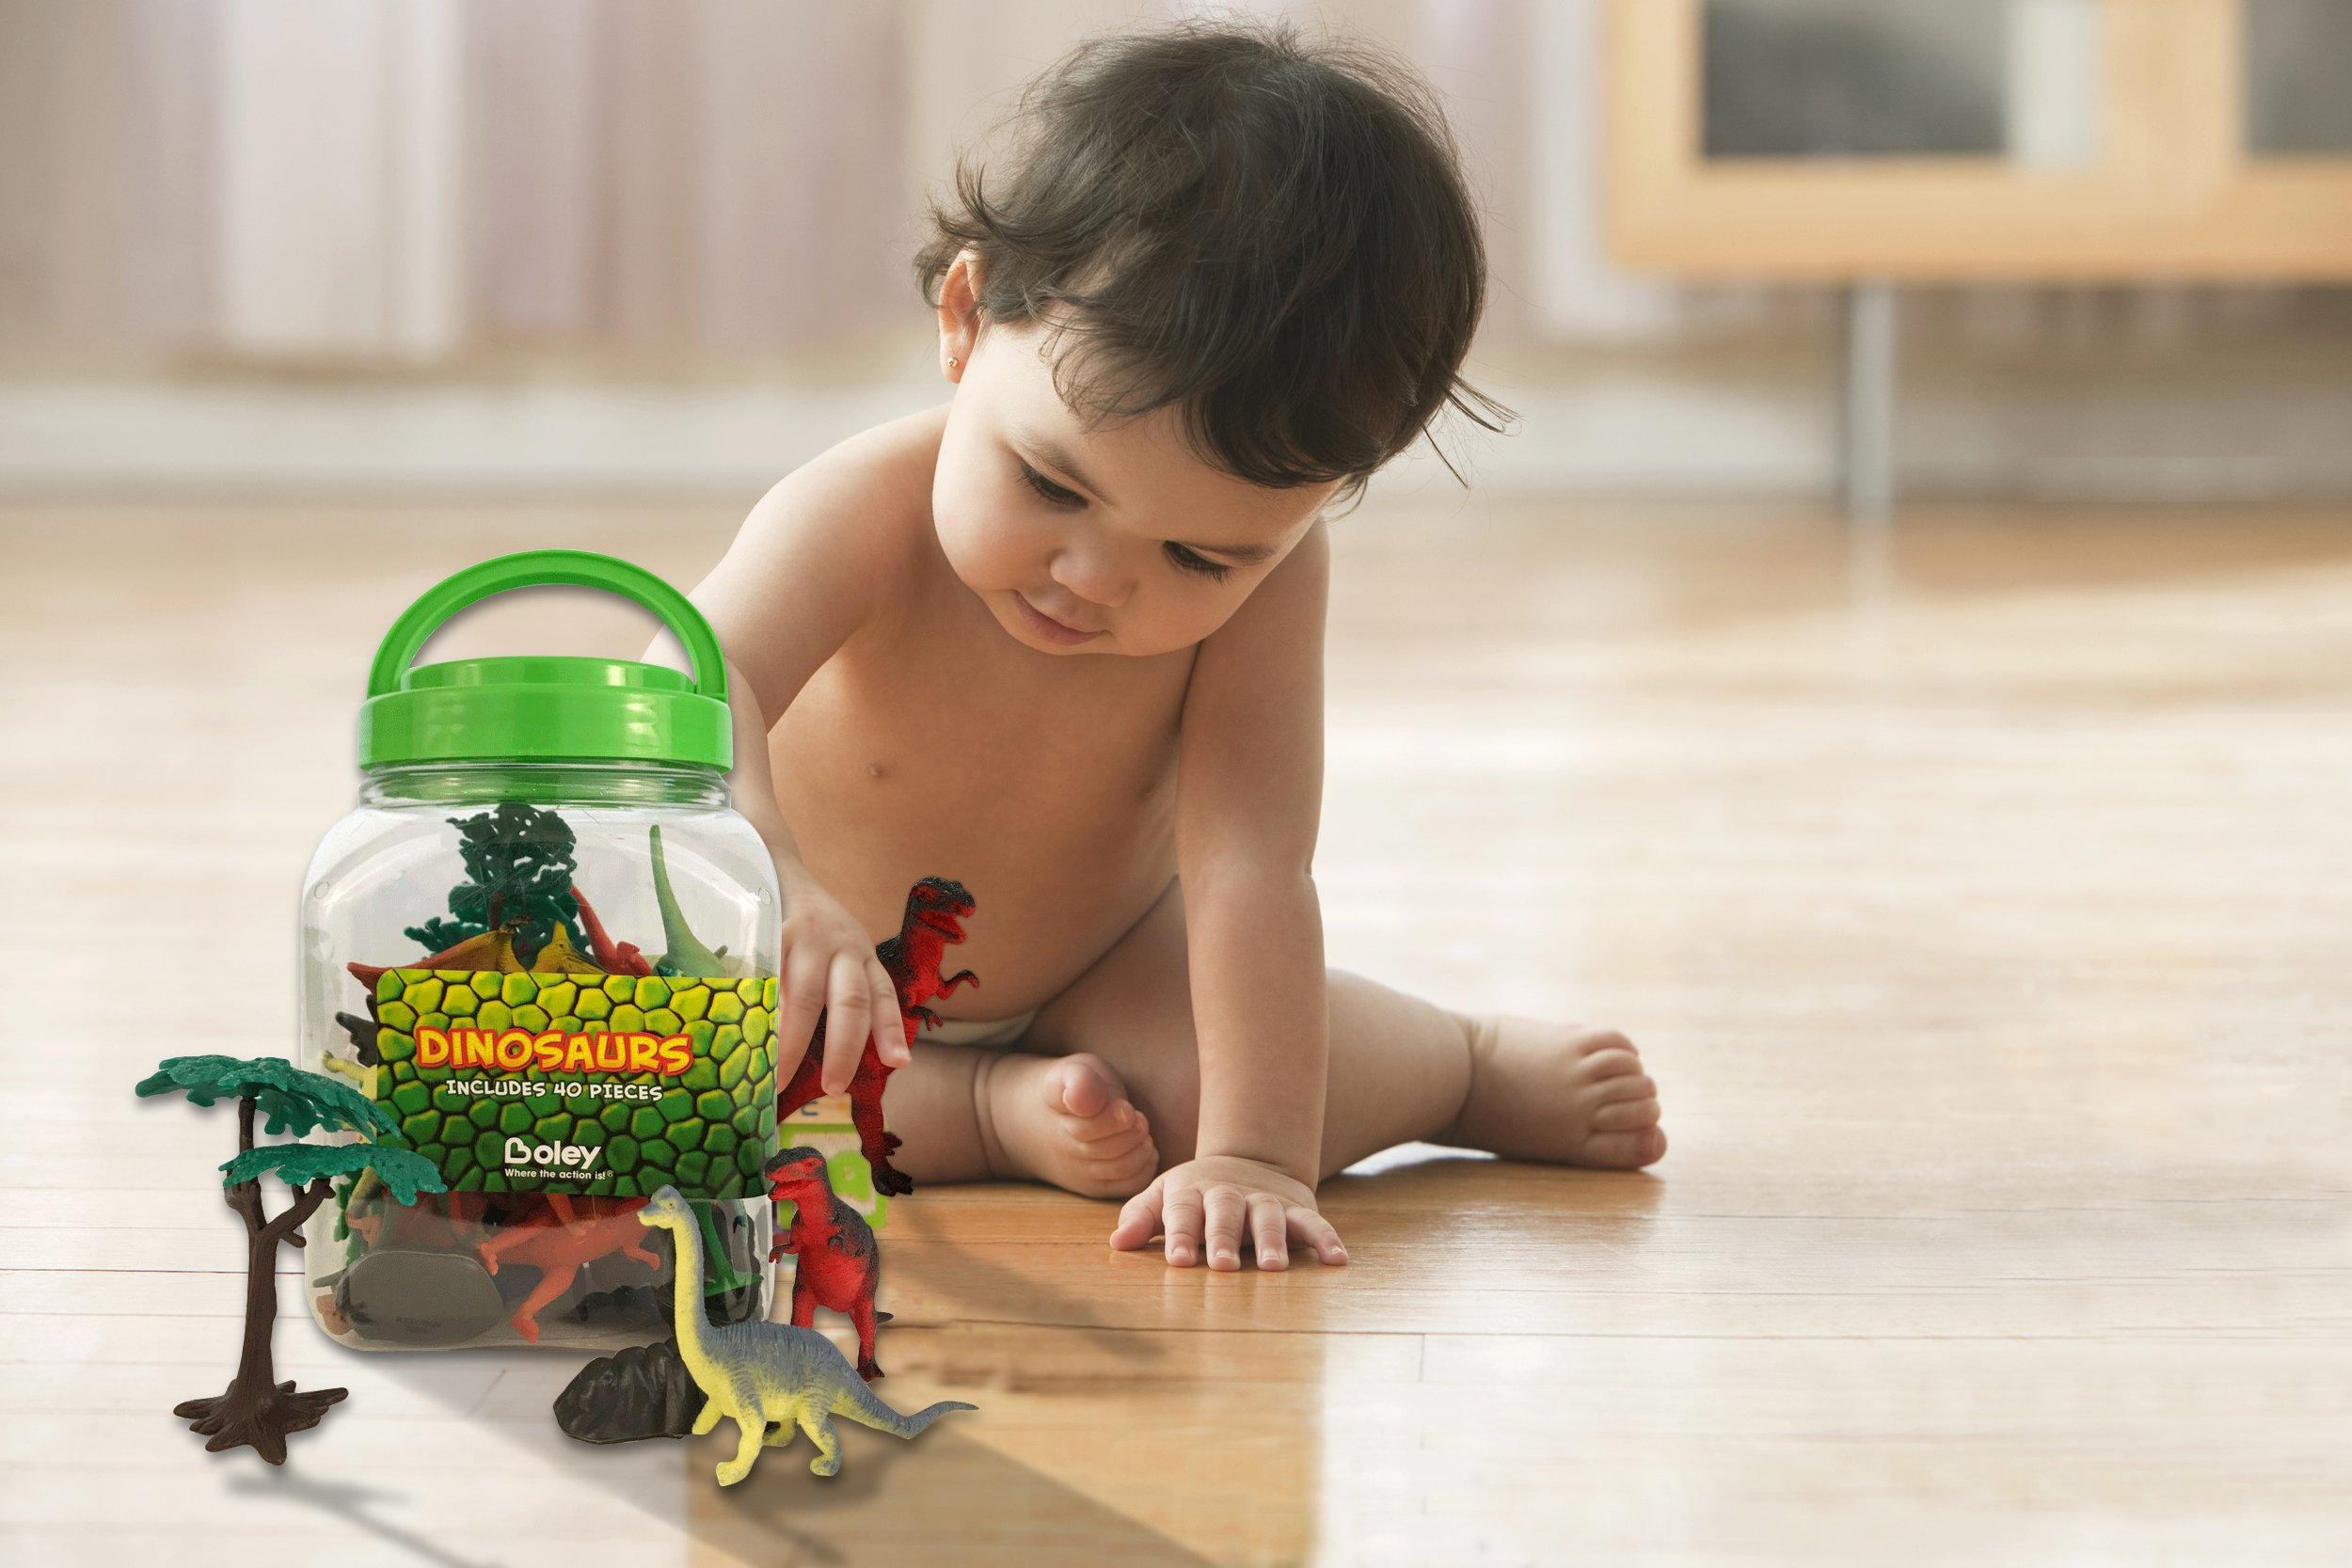 Boley 40 pc Big Bucket of Dinosaurs - Tub of educational dinosaur ...